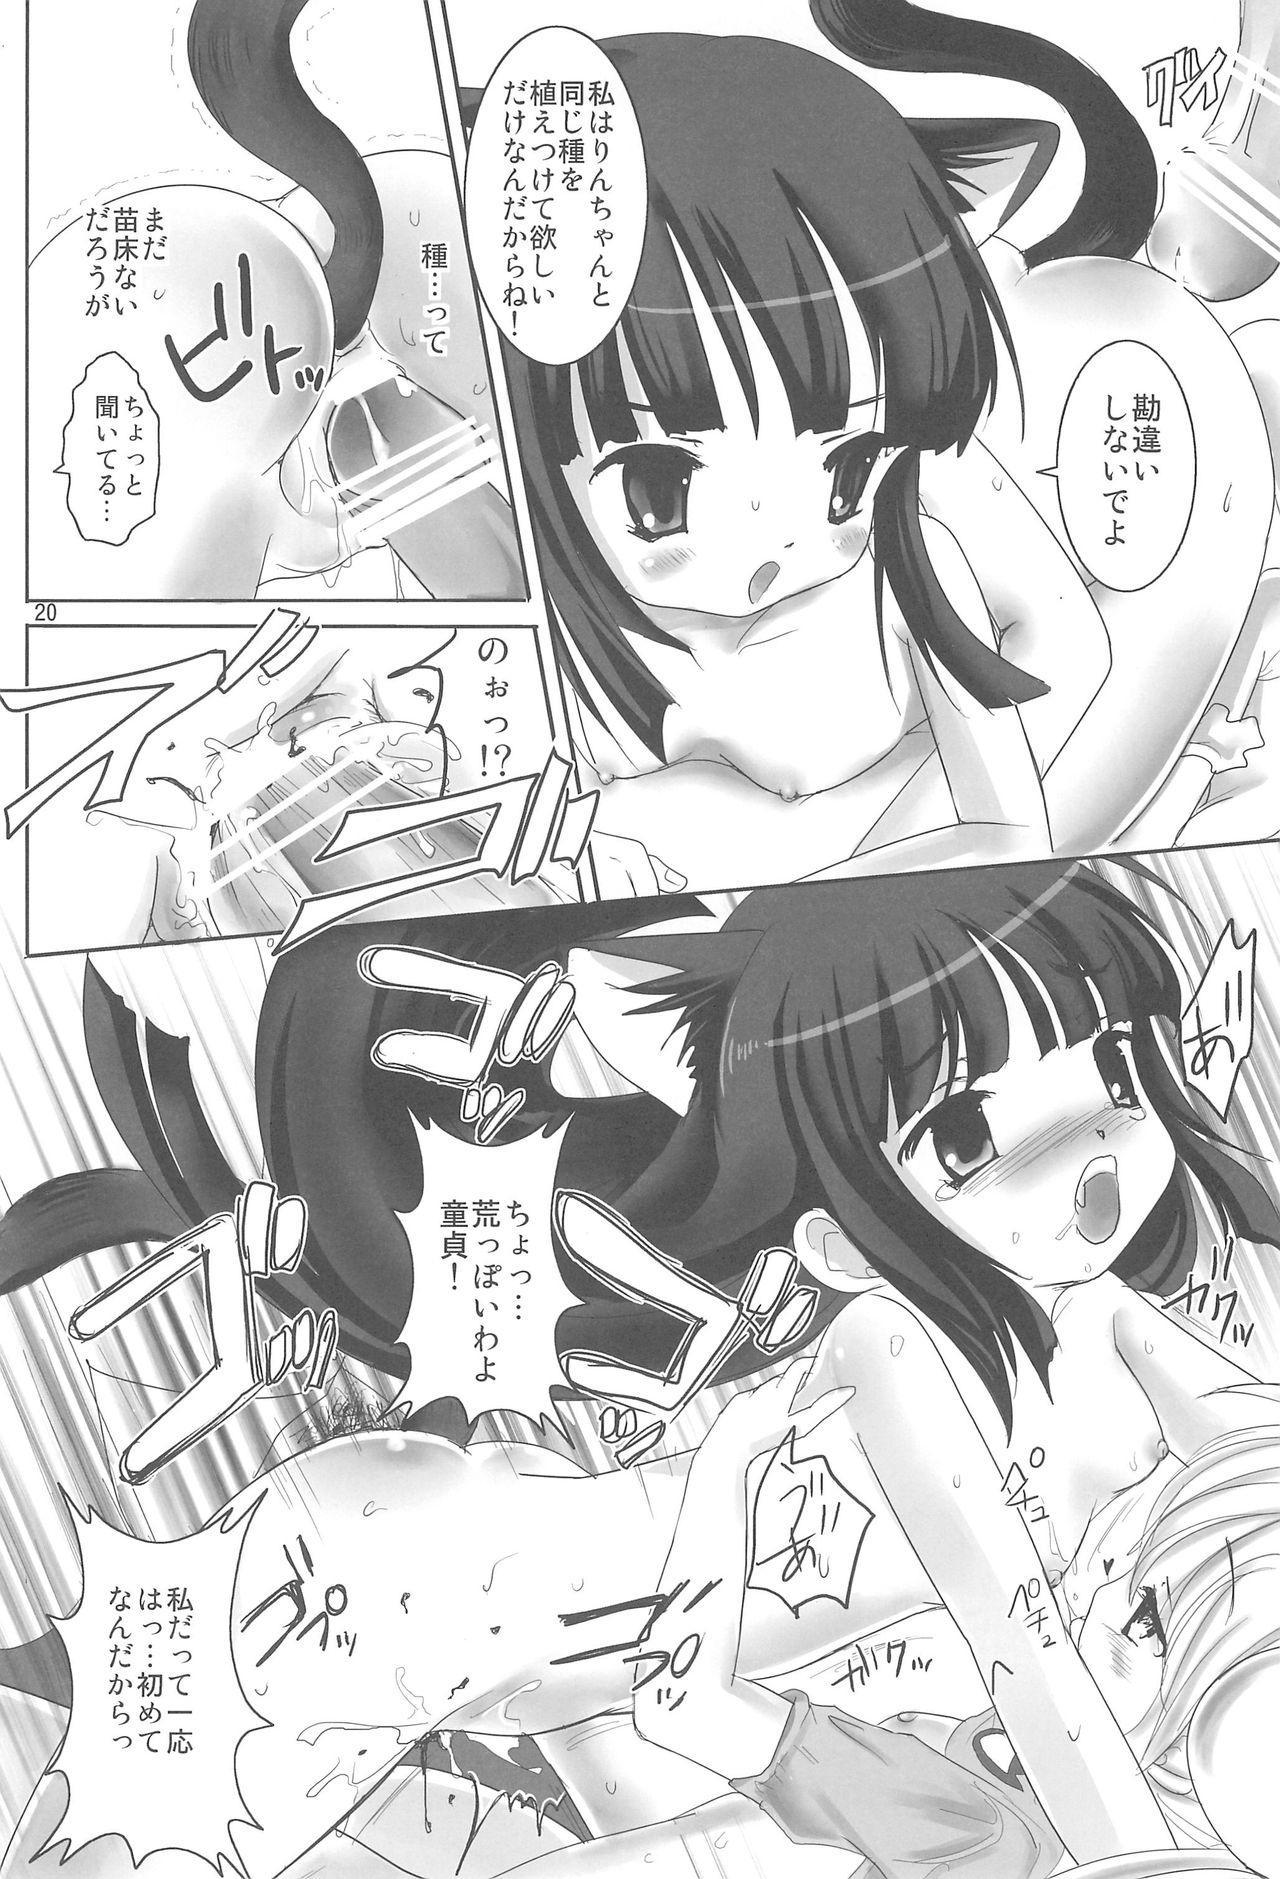 Crayon Rin-chan 18